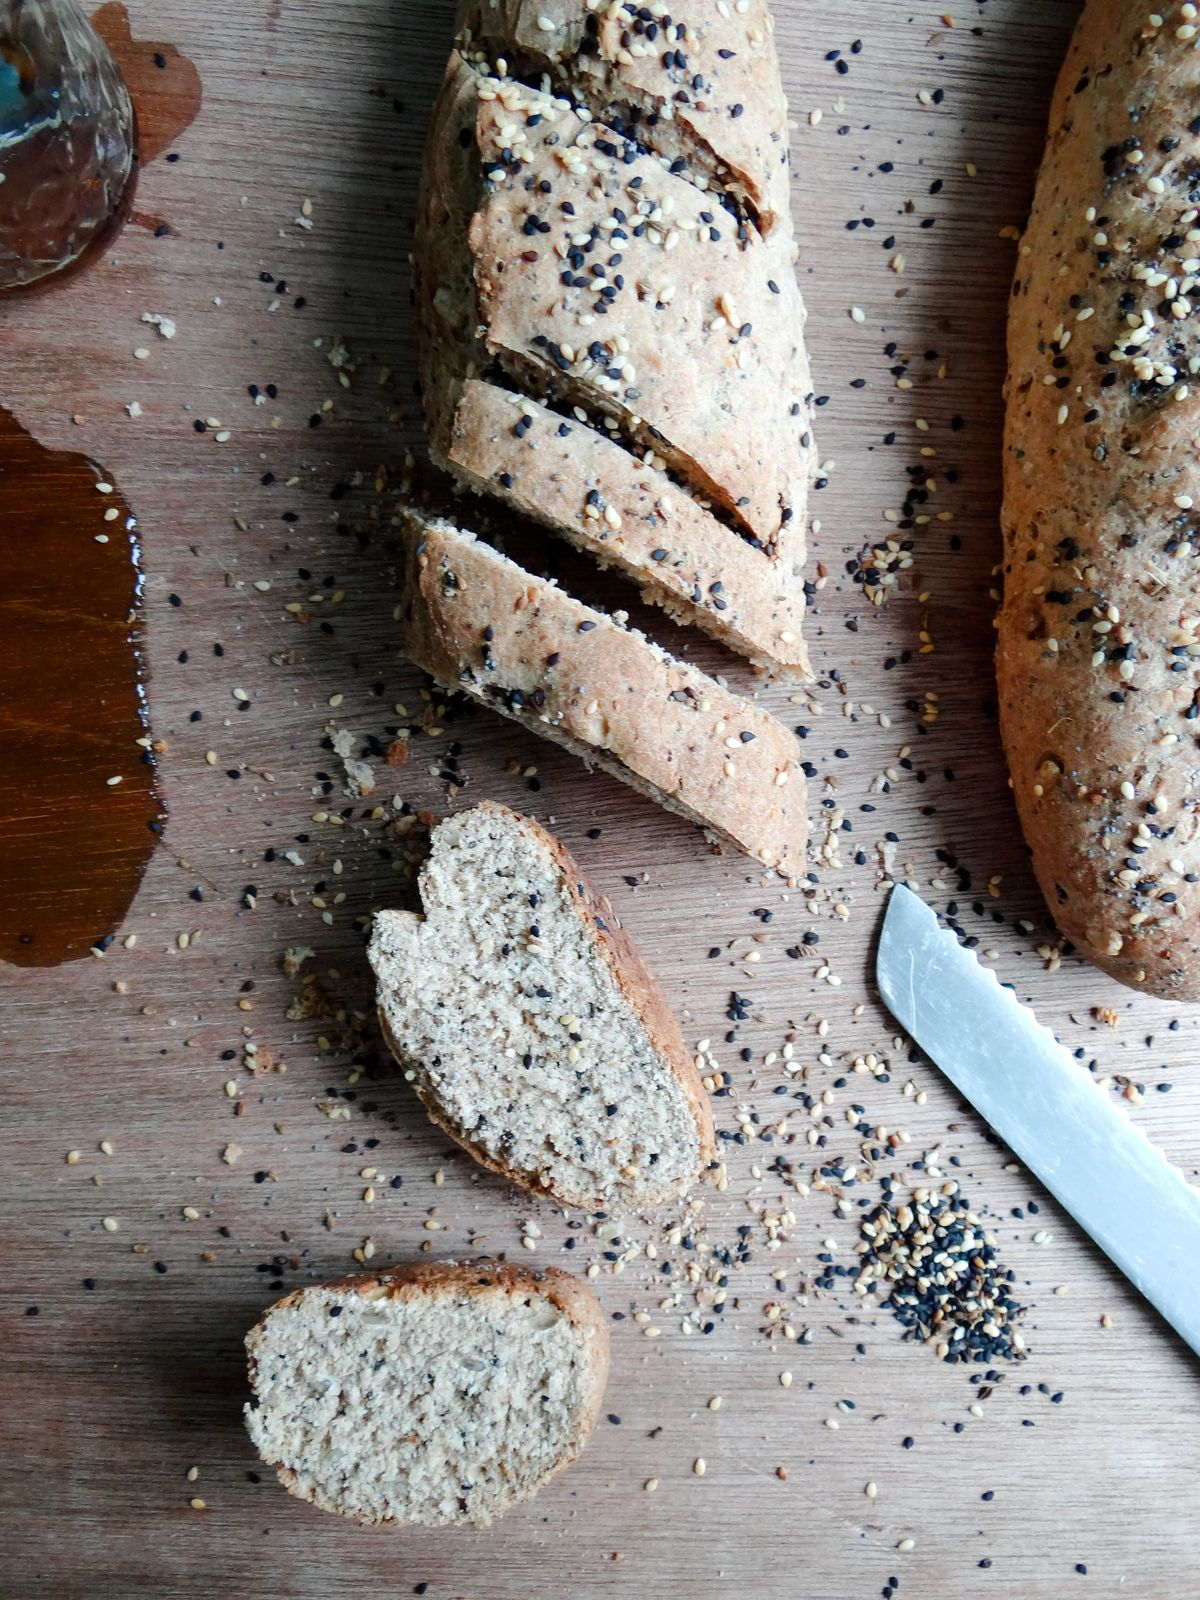 1h30 rijzen - 10min bakken (200 graden) - 10 min laten rusten  quiche: 1h laten rusten. 1uurtje bakken.